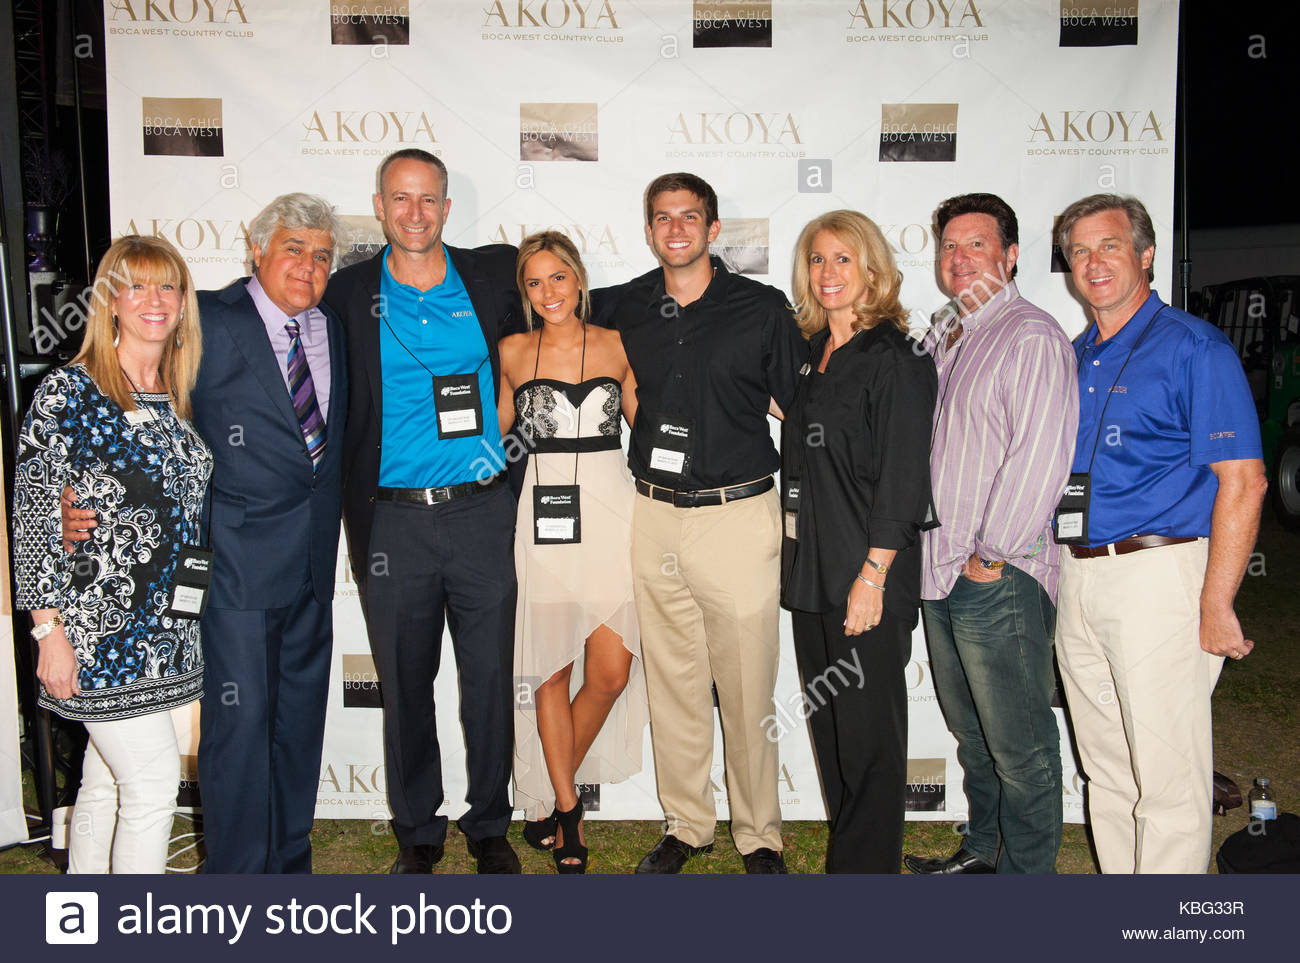 Jay Leno mit dem Sponsor AKOYA Familie und Freunde. Jay Leno, zusammen mit der Atlantic City Boys durchführen Stockbild